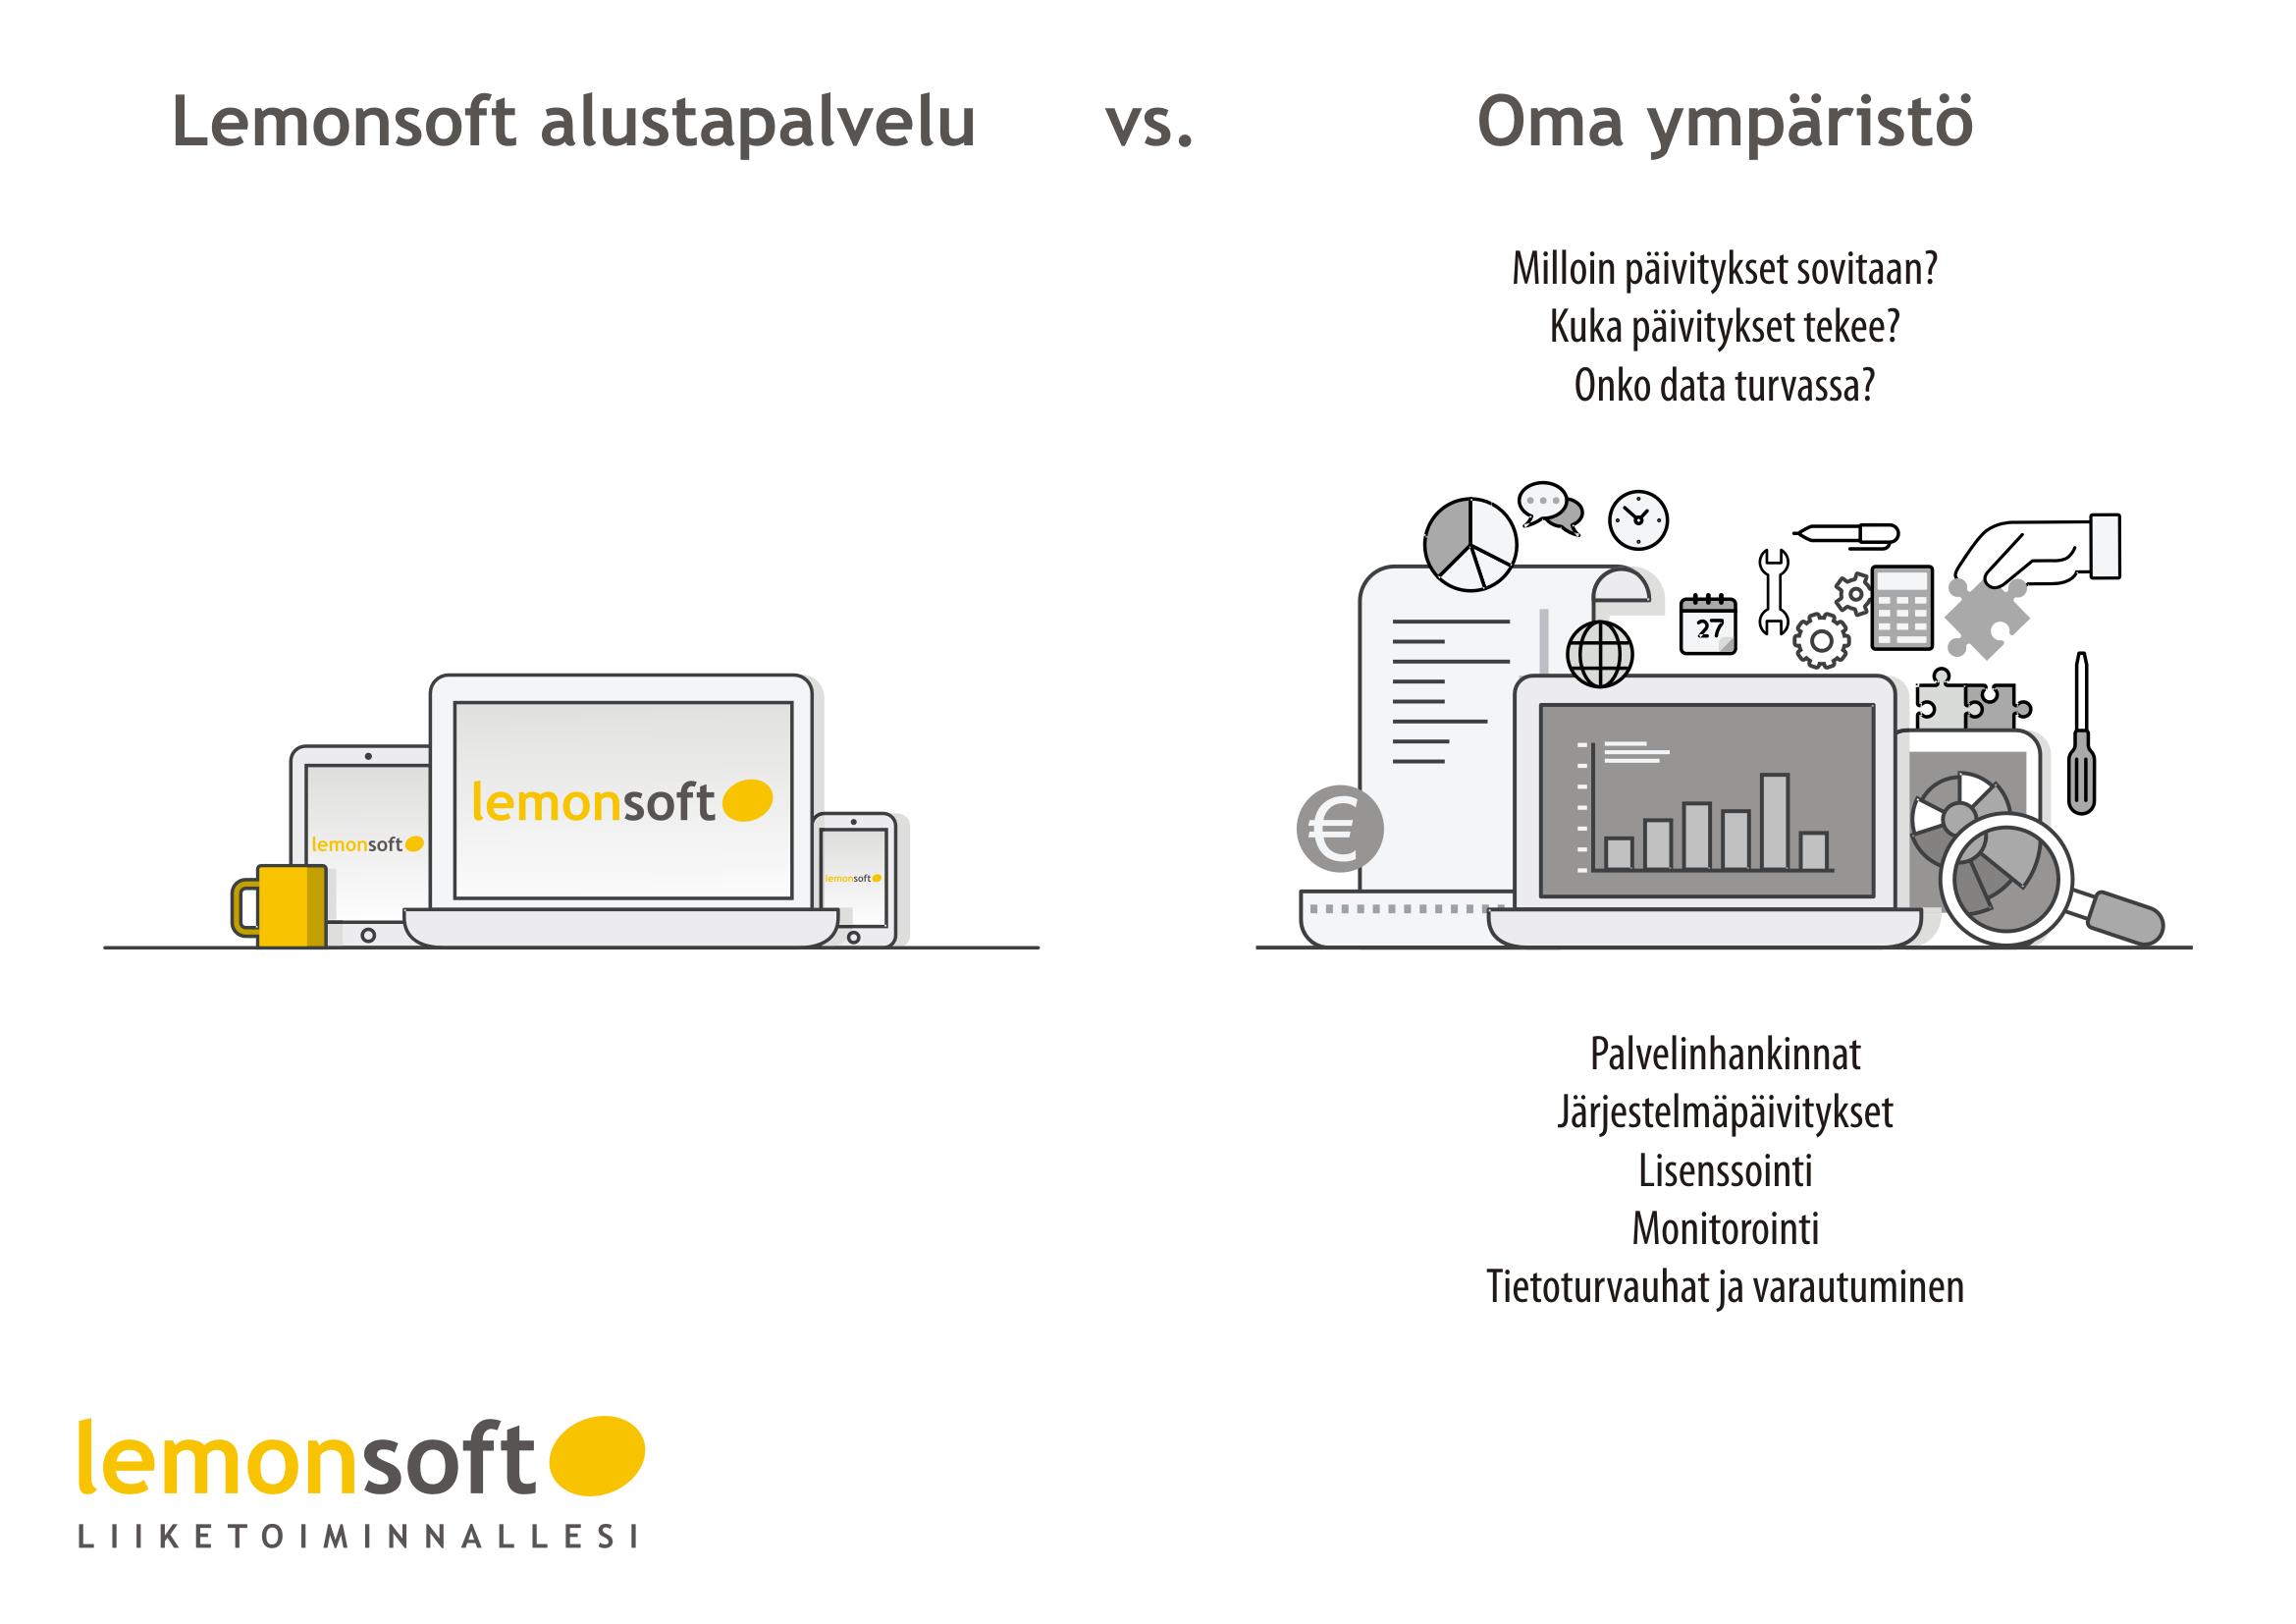 LemonAlustapalv_vs_muut